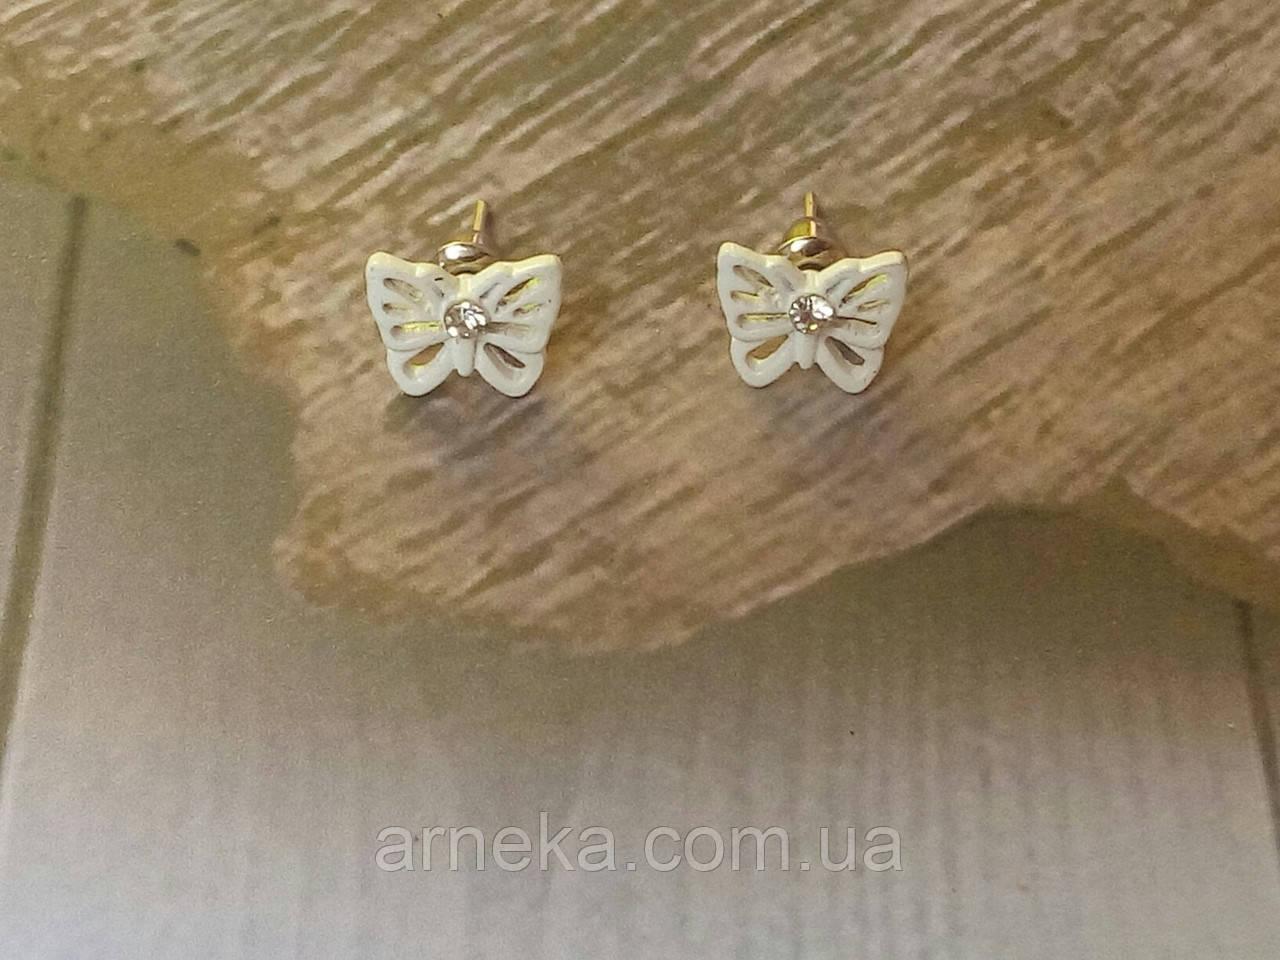 Сережки-гвоздики метелики (металеві)